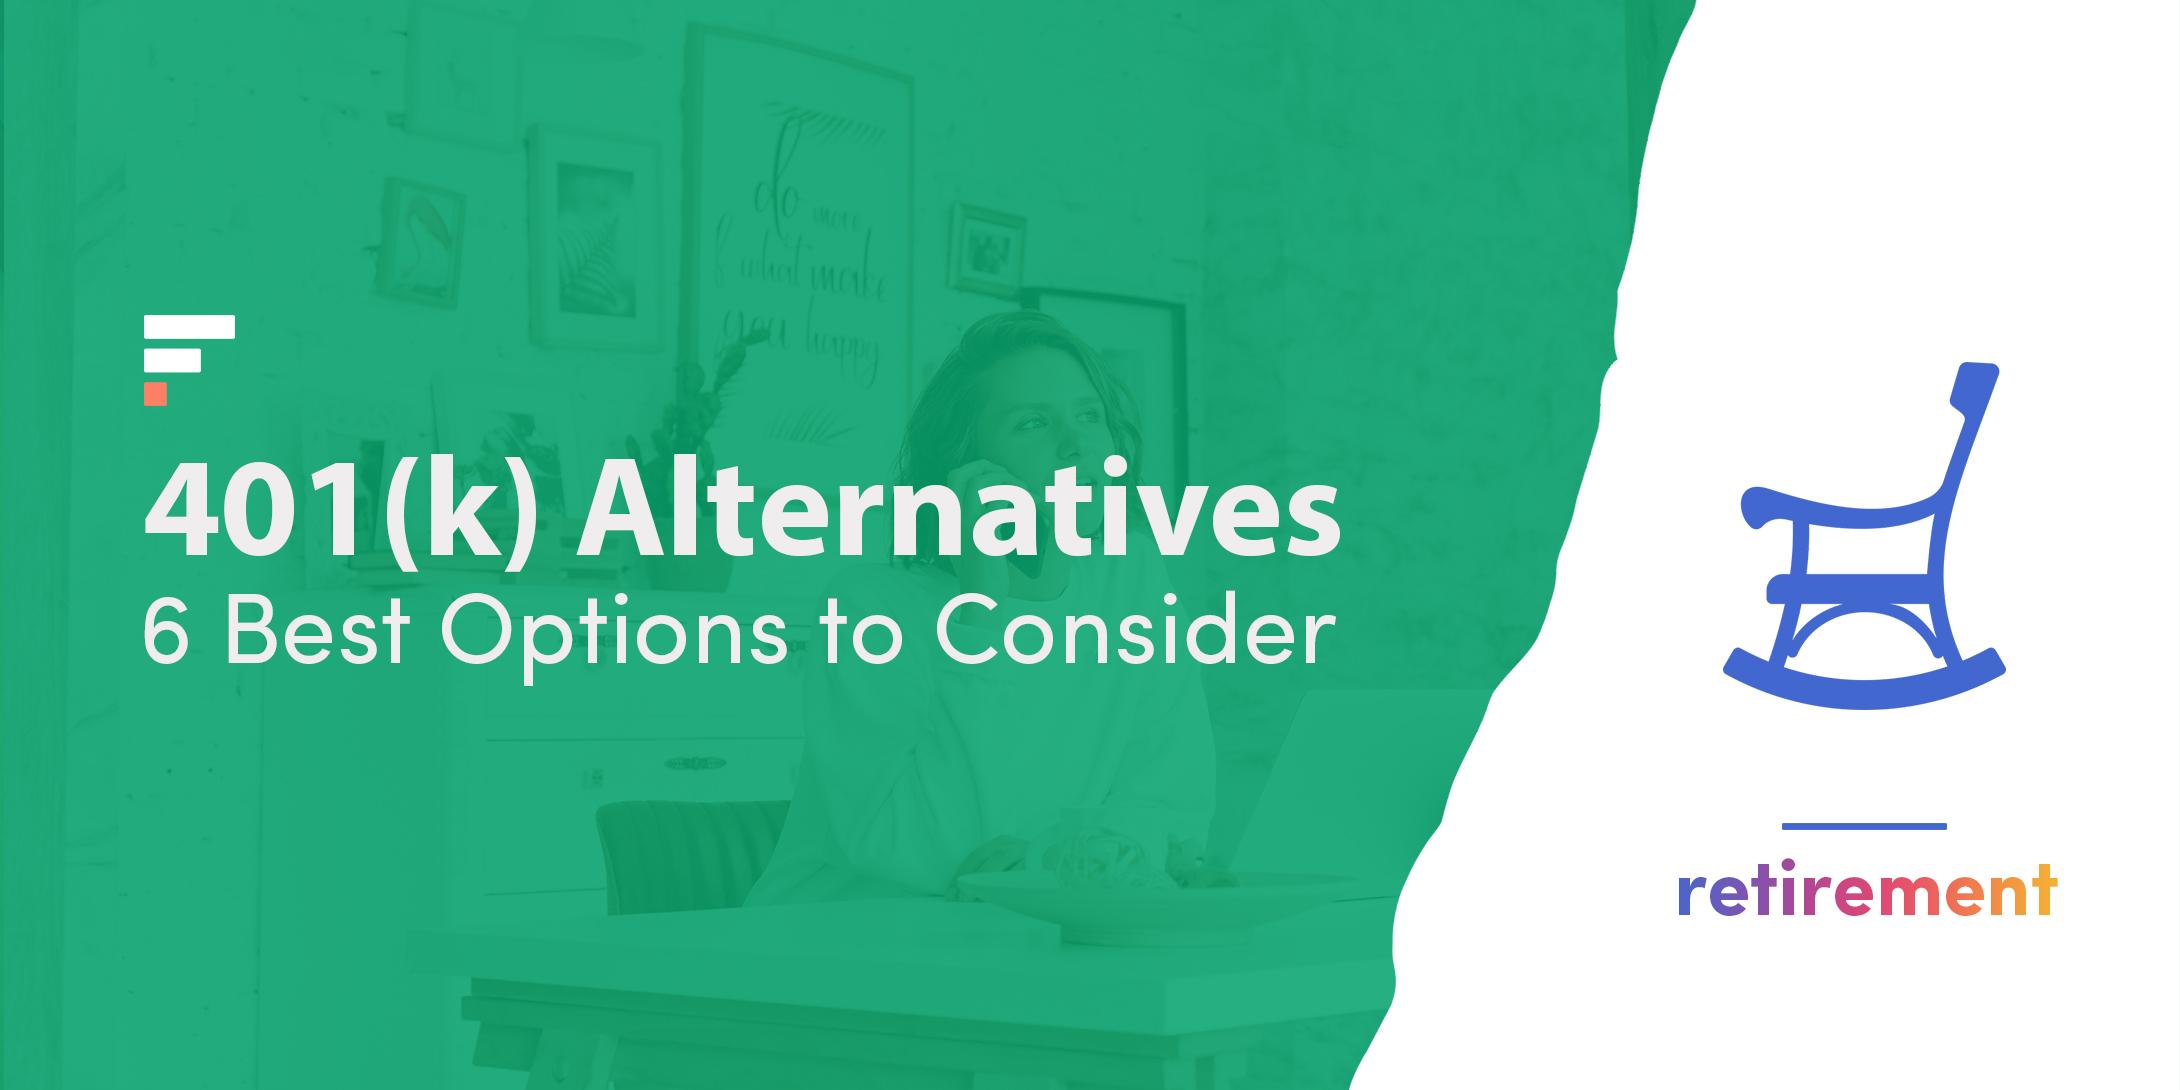 401(k) Alternatives: 6 Best Options to Consider